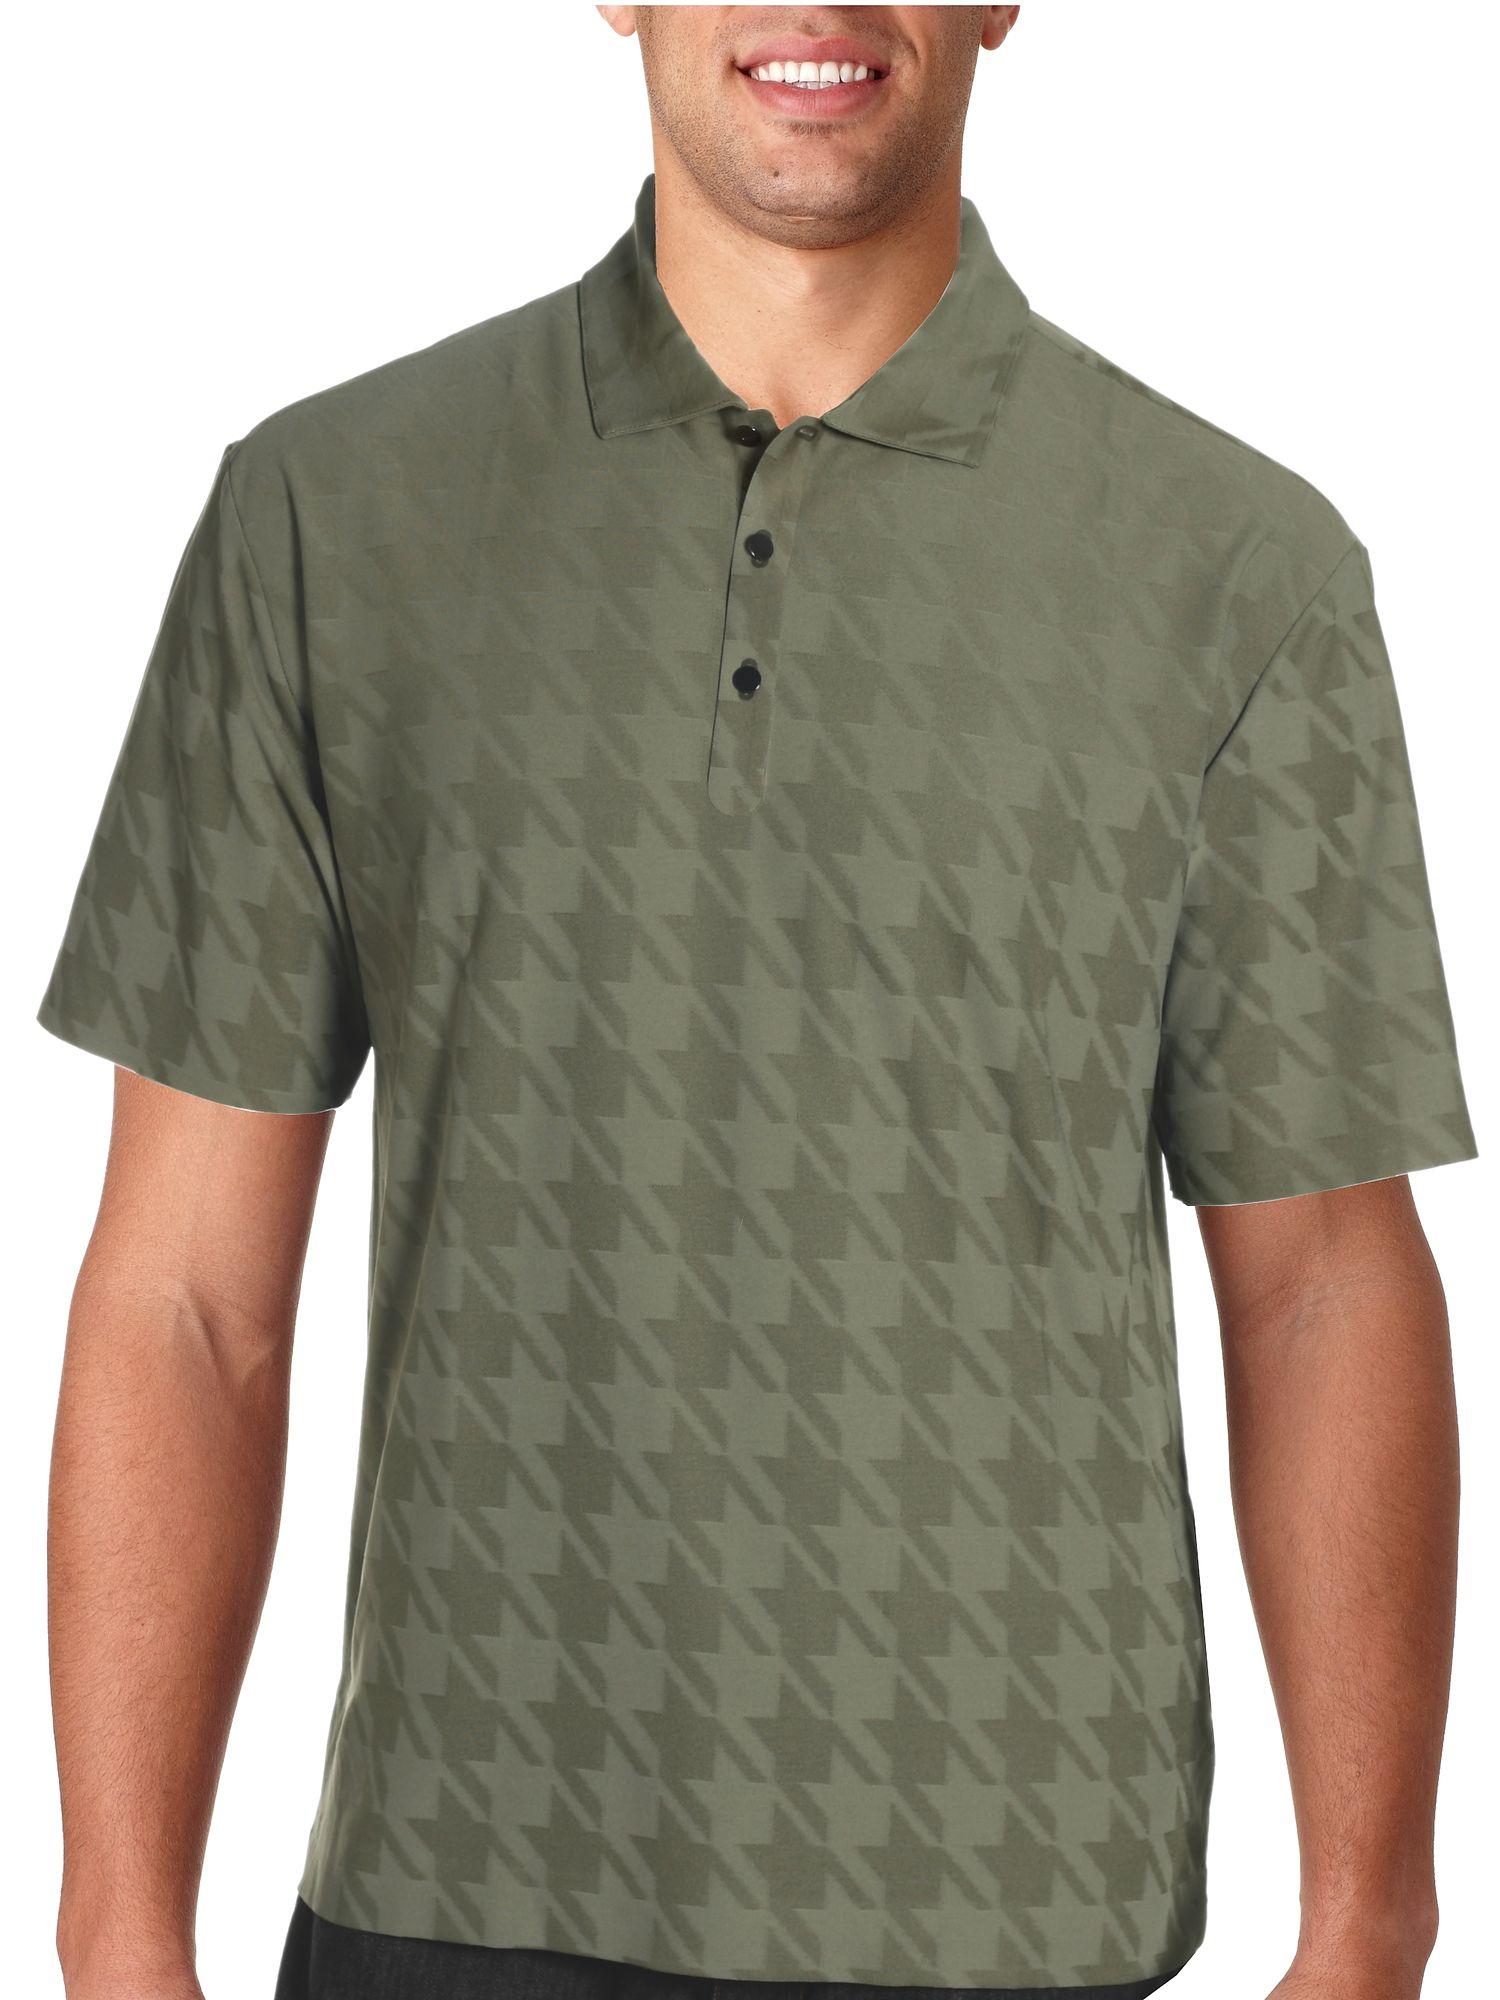 Nike Golf Dri Fit Mens Polo Shirt Sz Xlarge Green 100 336881